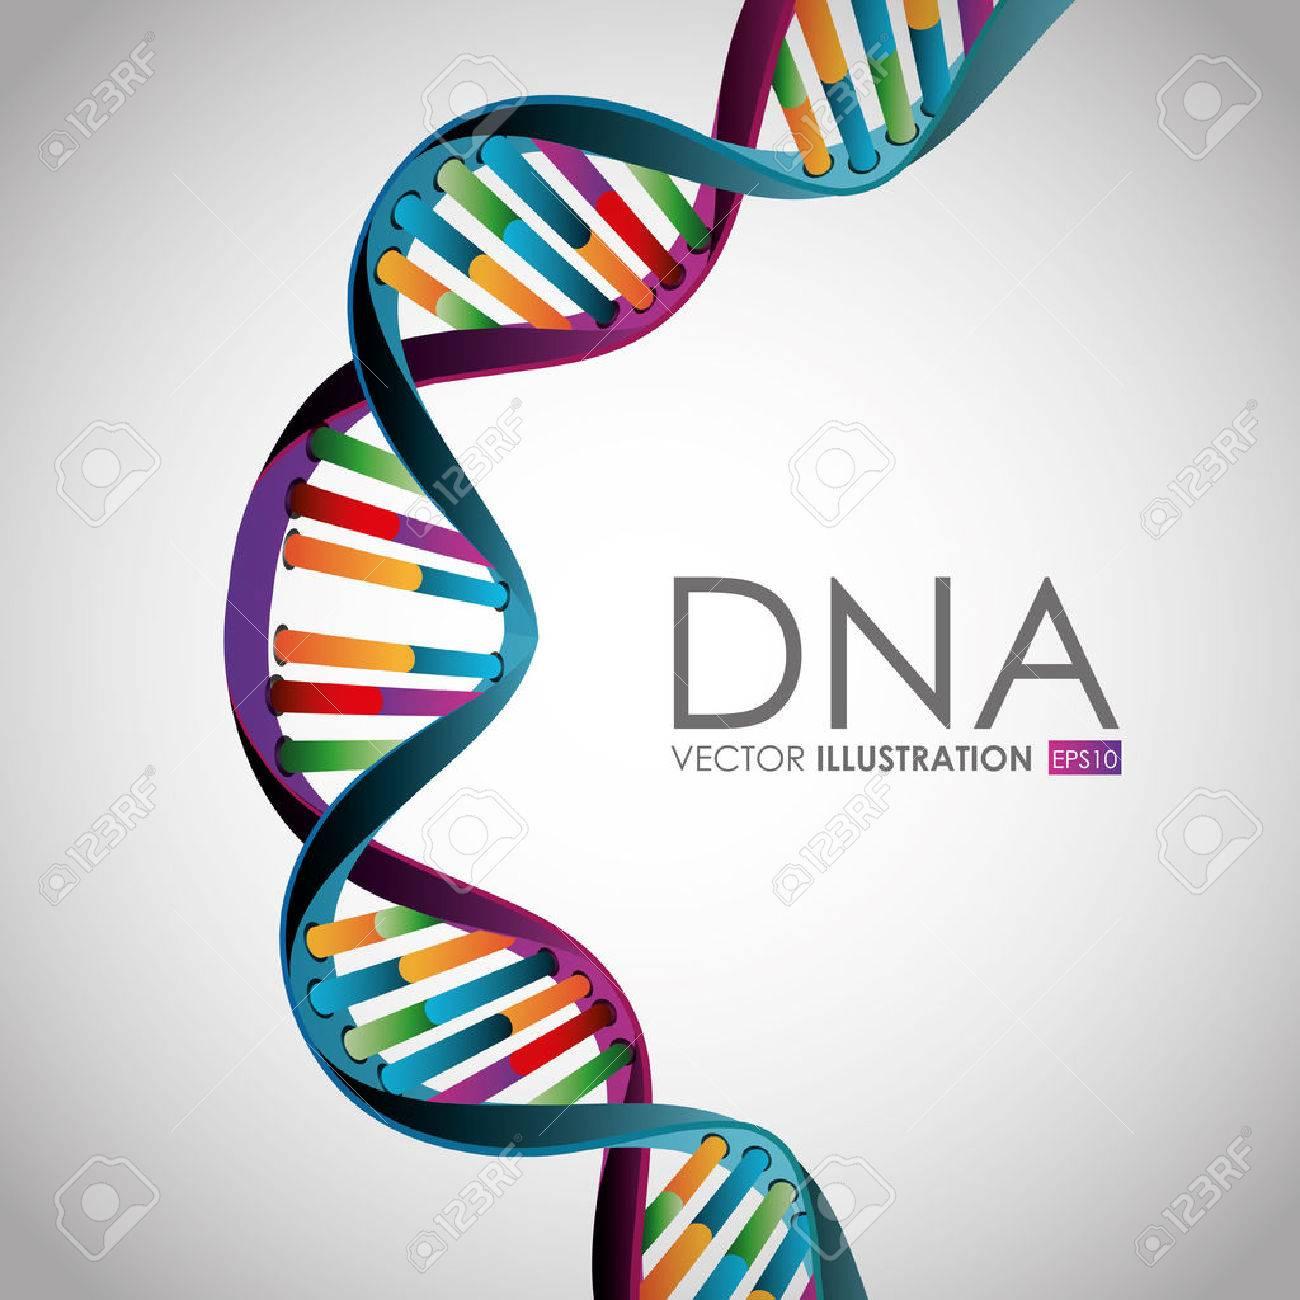 DNA design over white background,vector illustration. - 37512367